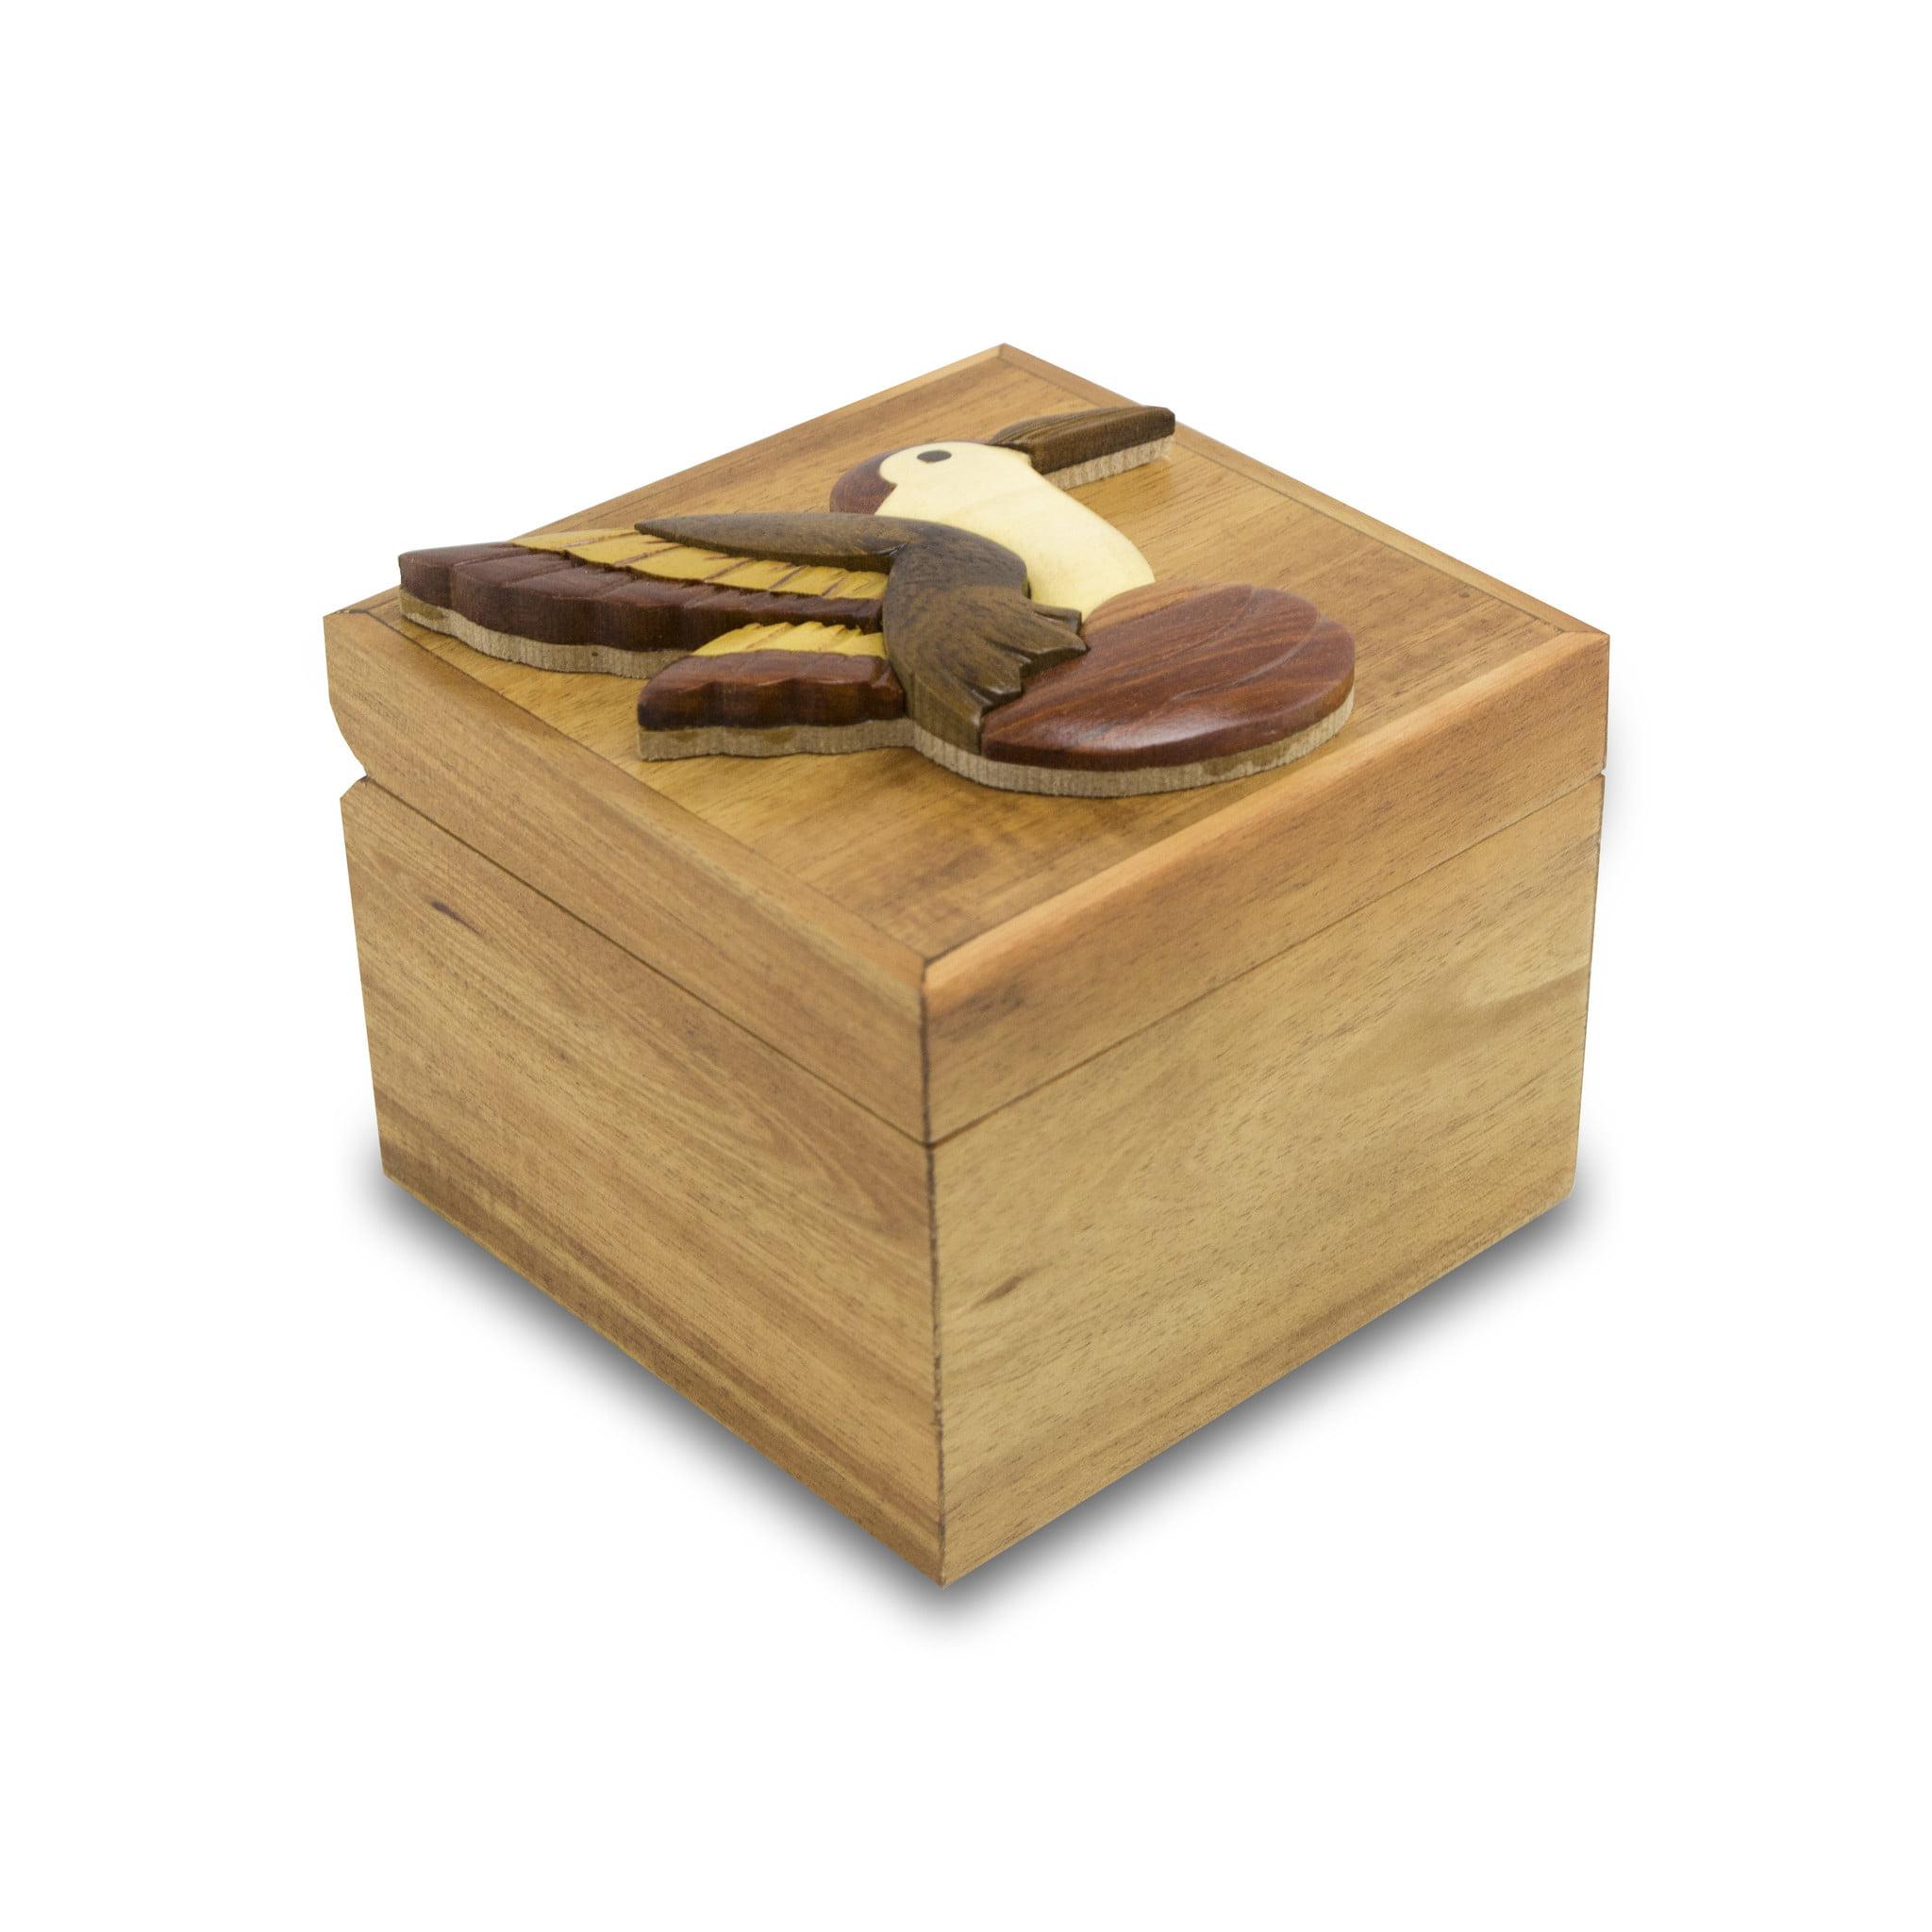 NEW! Intarsia Wood Cremation Keepsake Box - Hummingbird